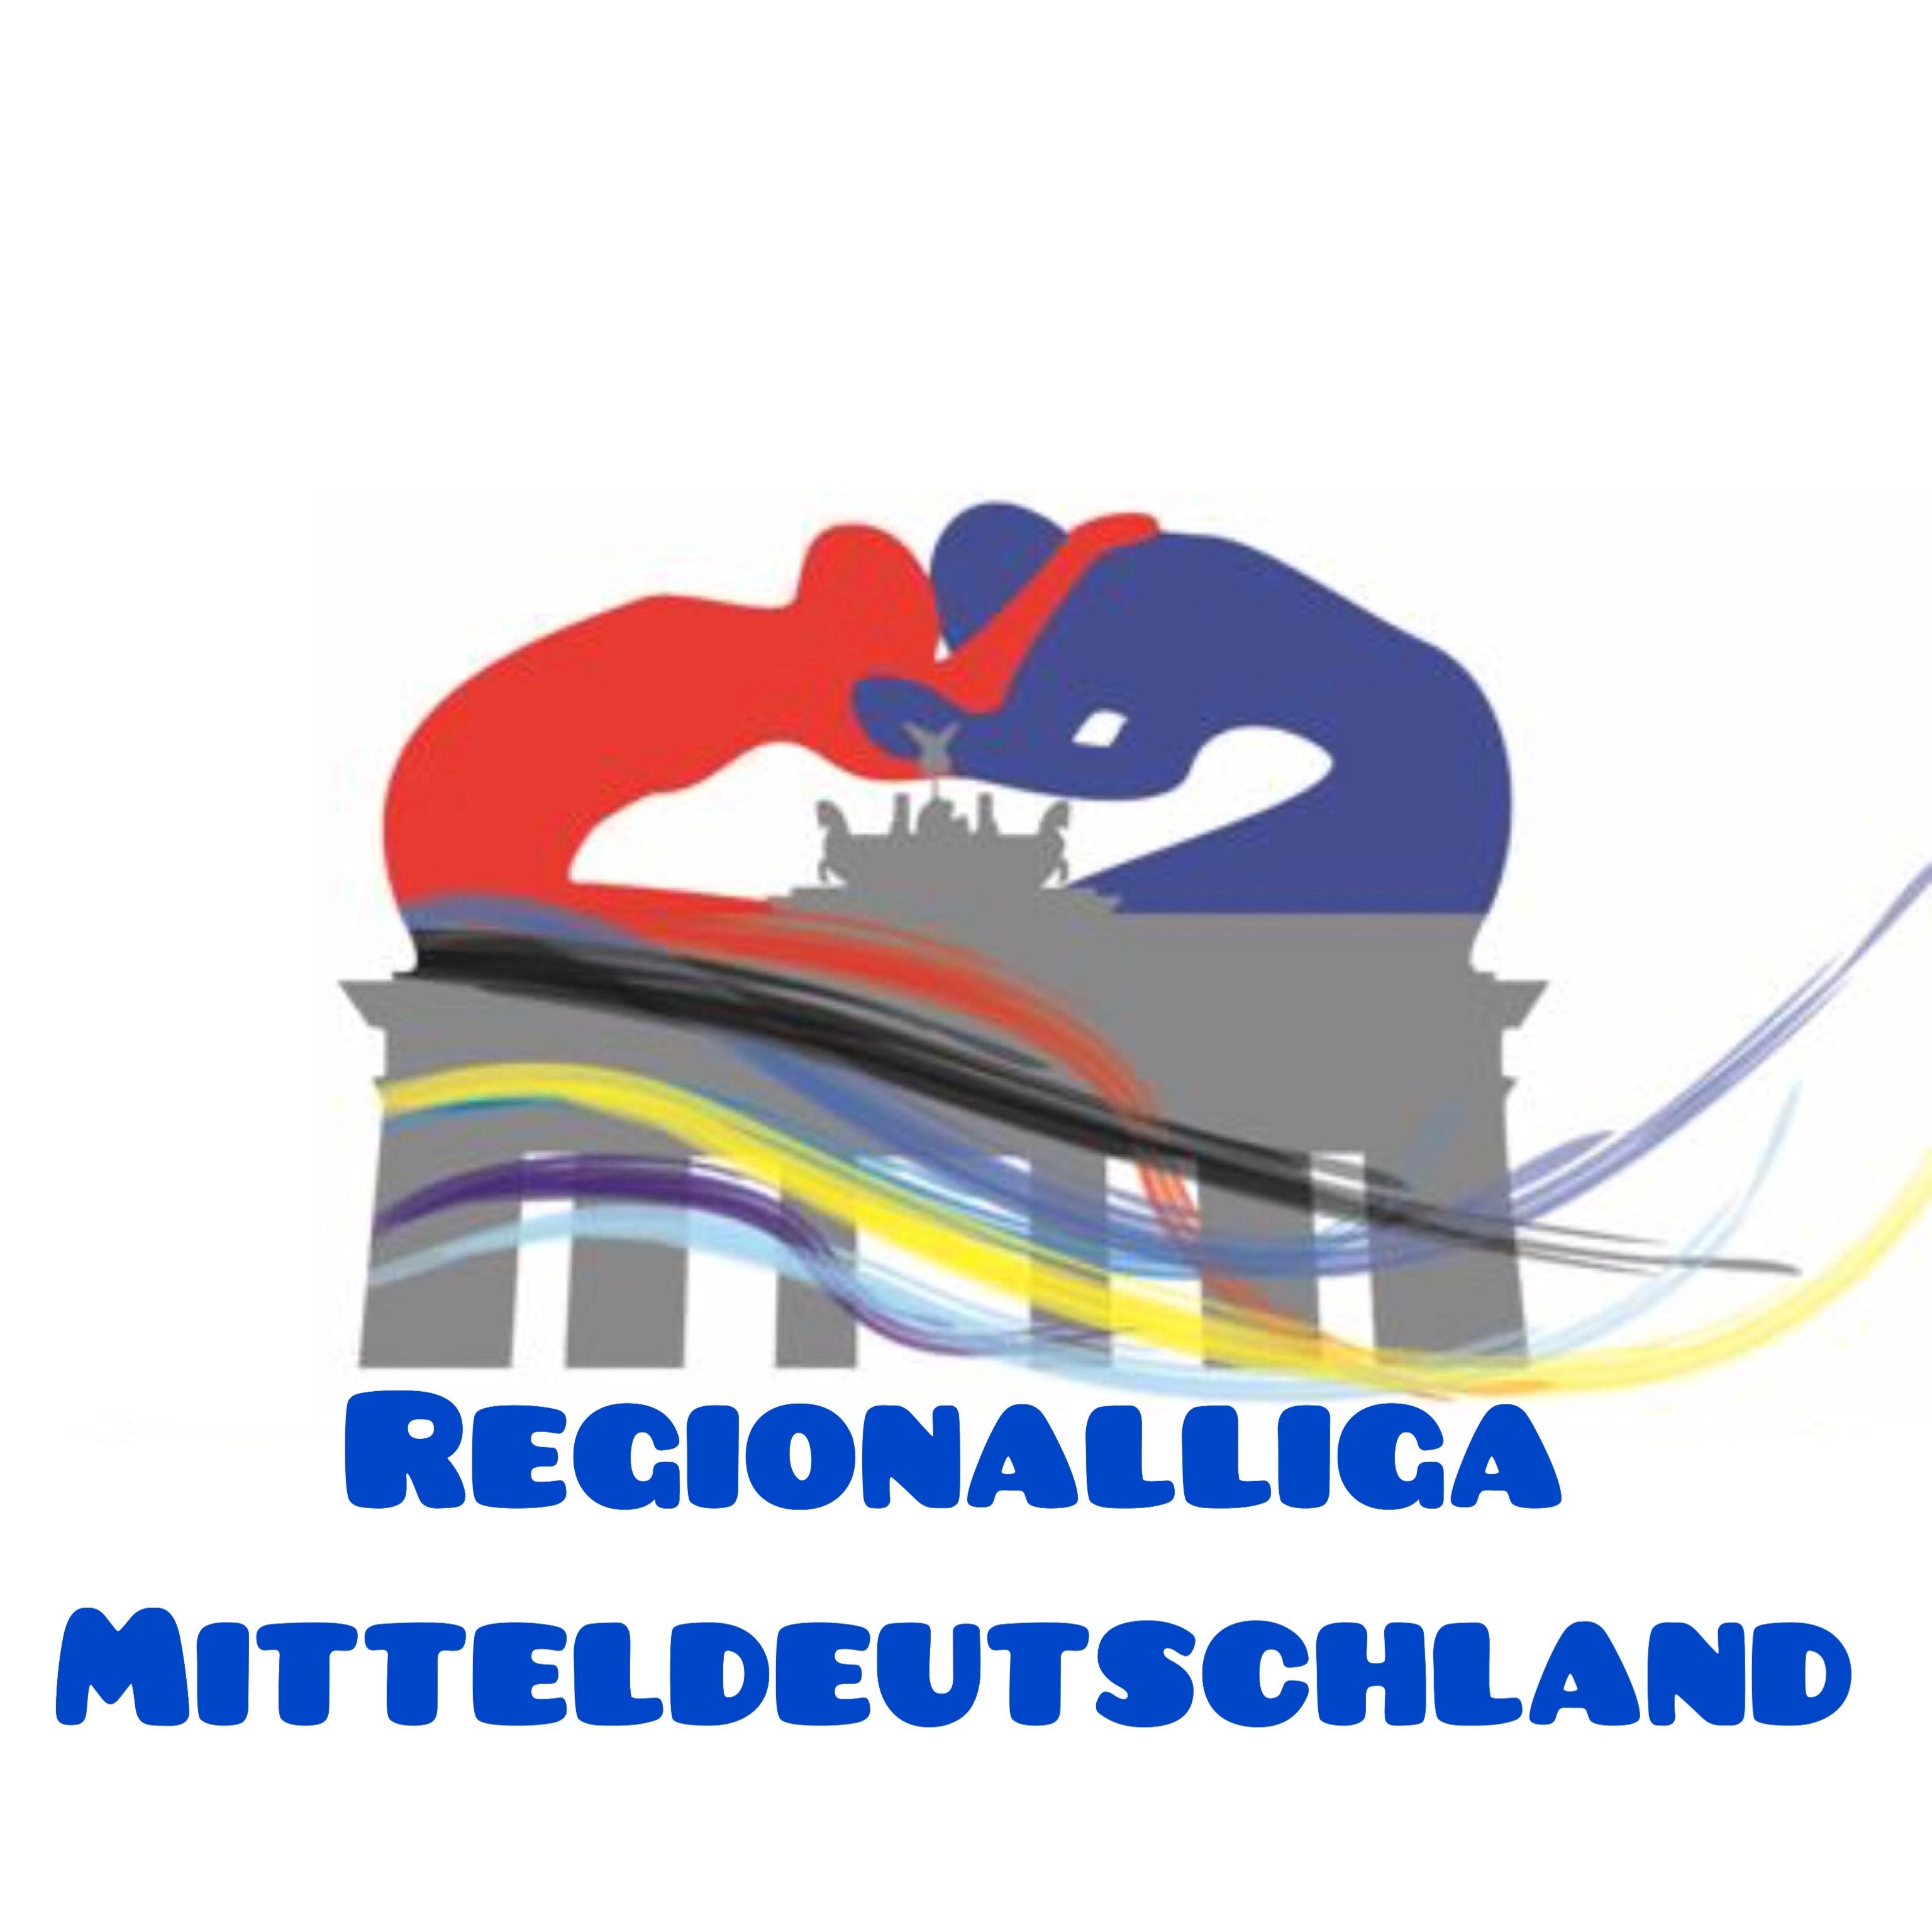 ABGESAGT! RL-Auswärtskampf gg. RV Thalheim